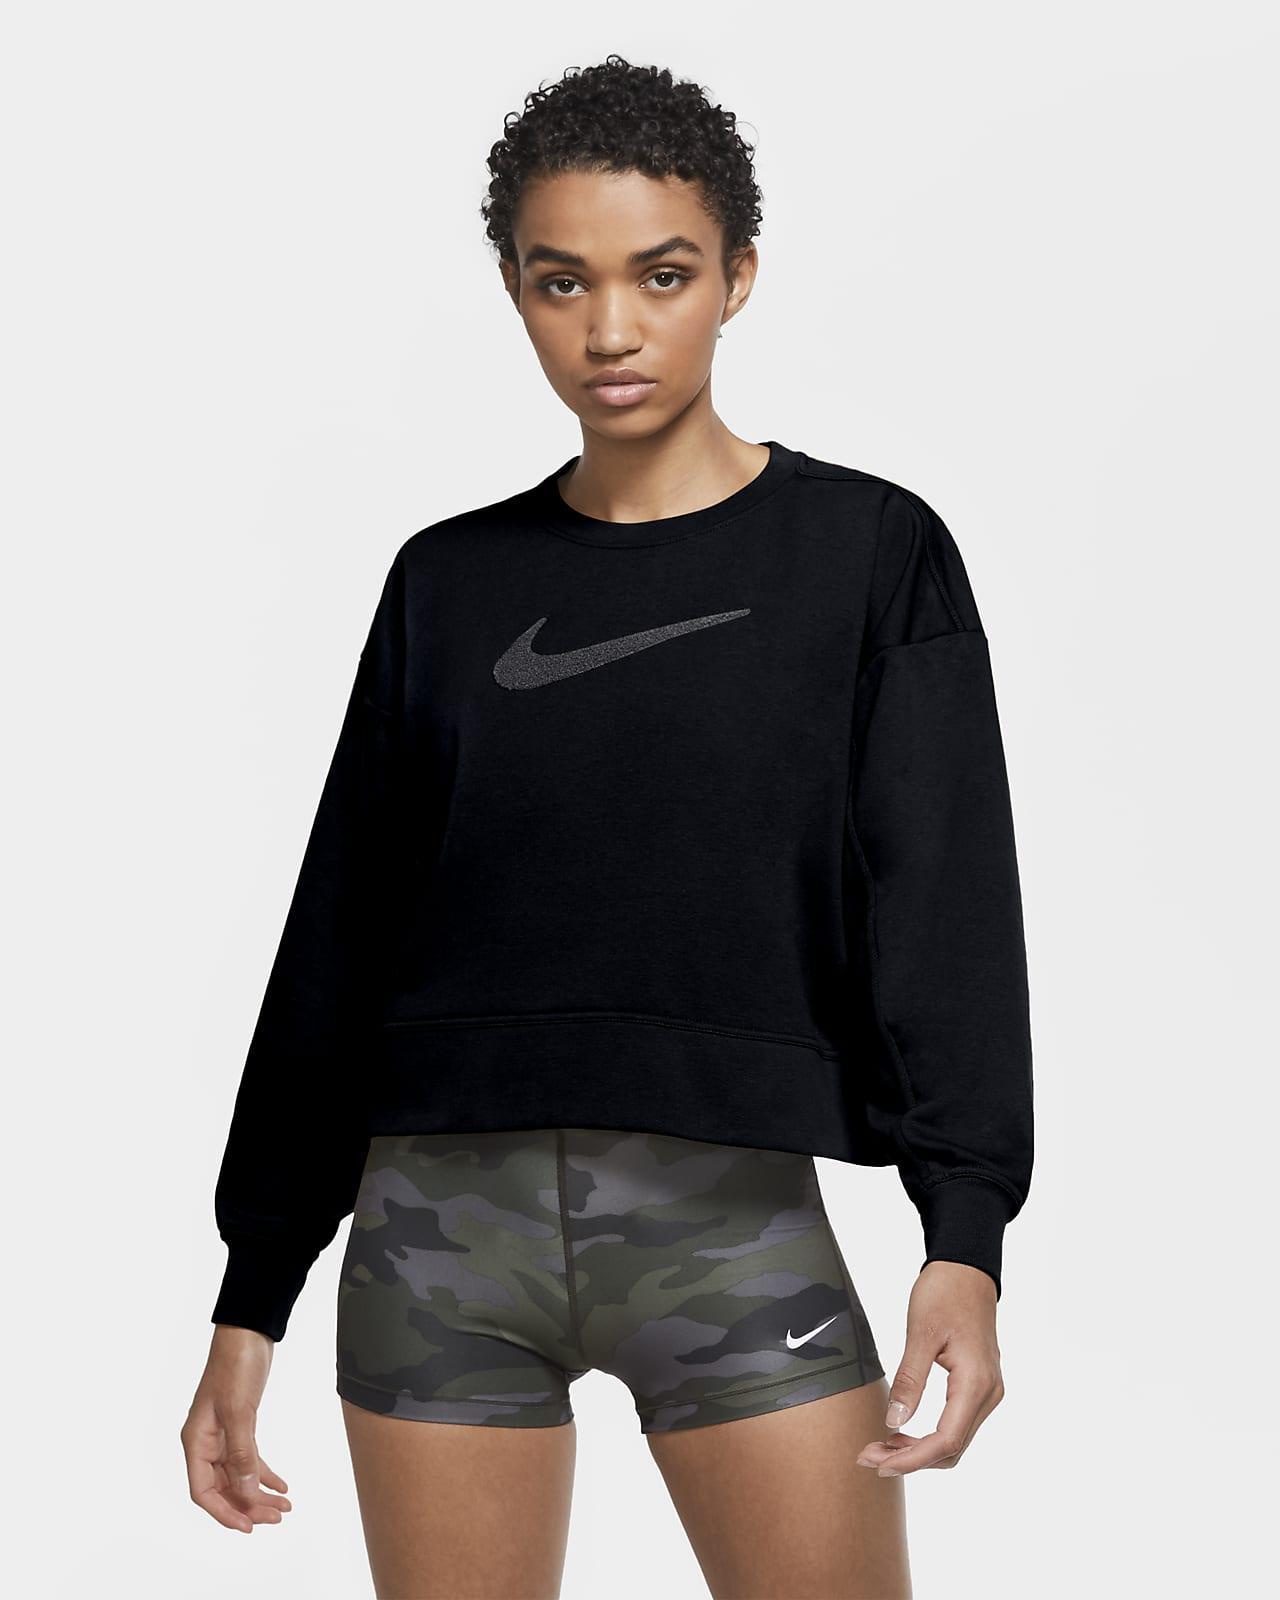 Женский свитшот с логотипом Swoosh для тренинга Nike Dri-FIT Get Fit